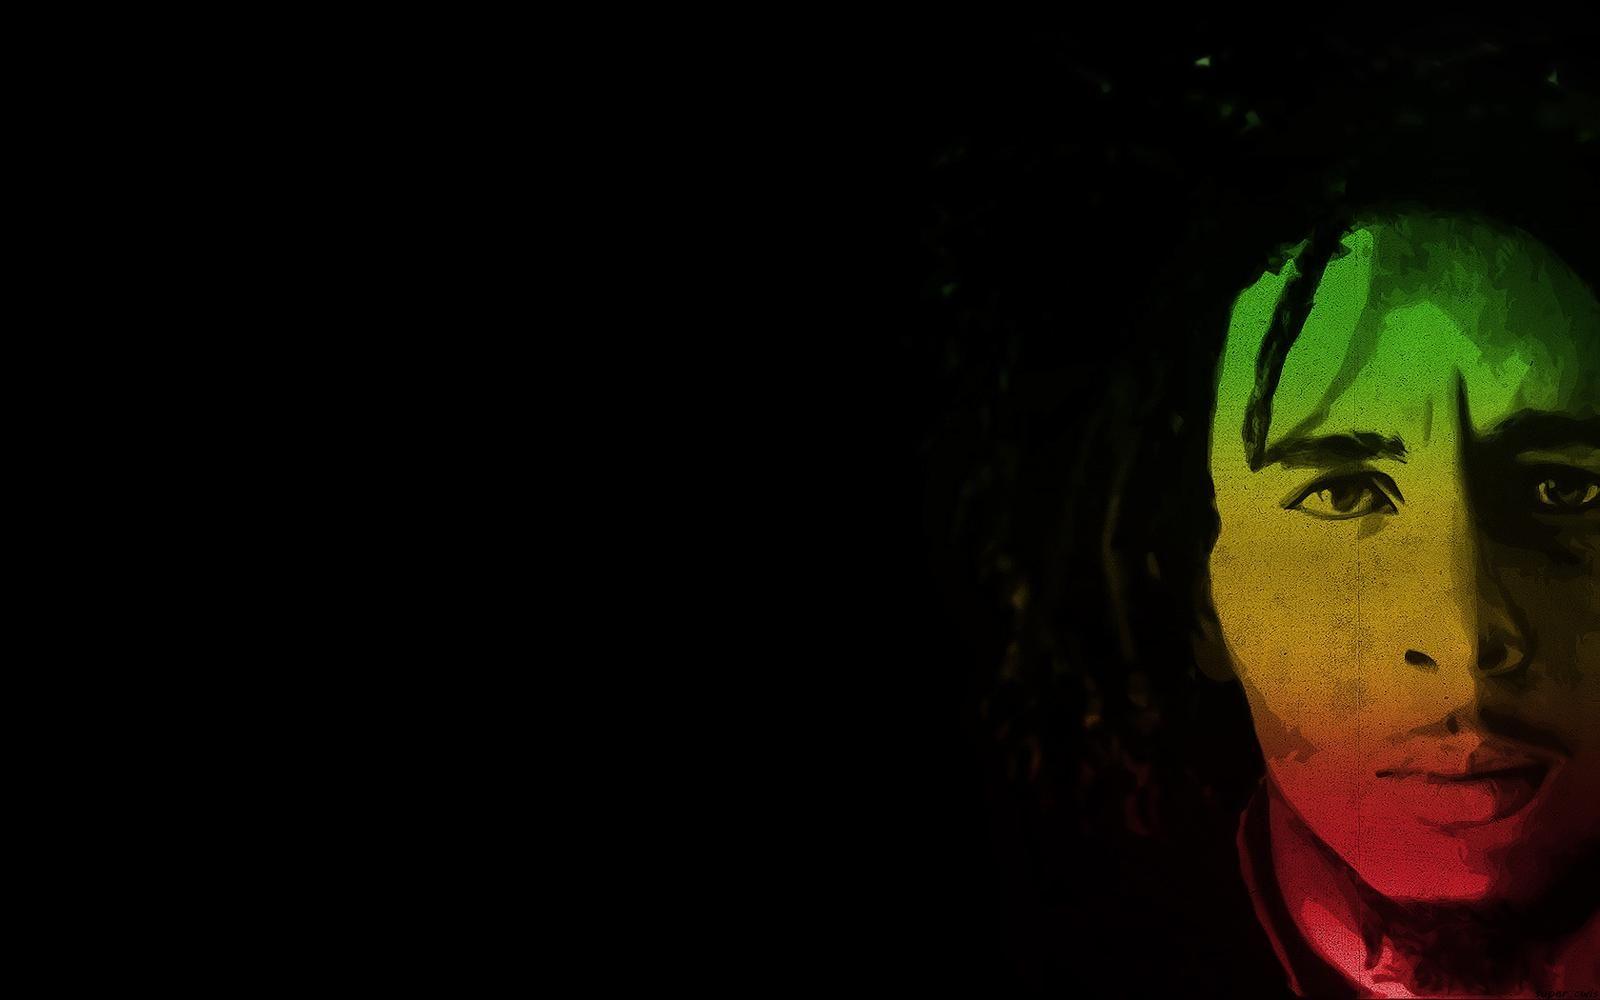 Fonds D Ecran Graffiti Rasta Background 1089 Fond D Ecran Hd Wallawy Bob Marley Best Background Images Marley